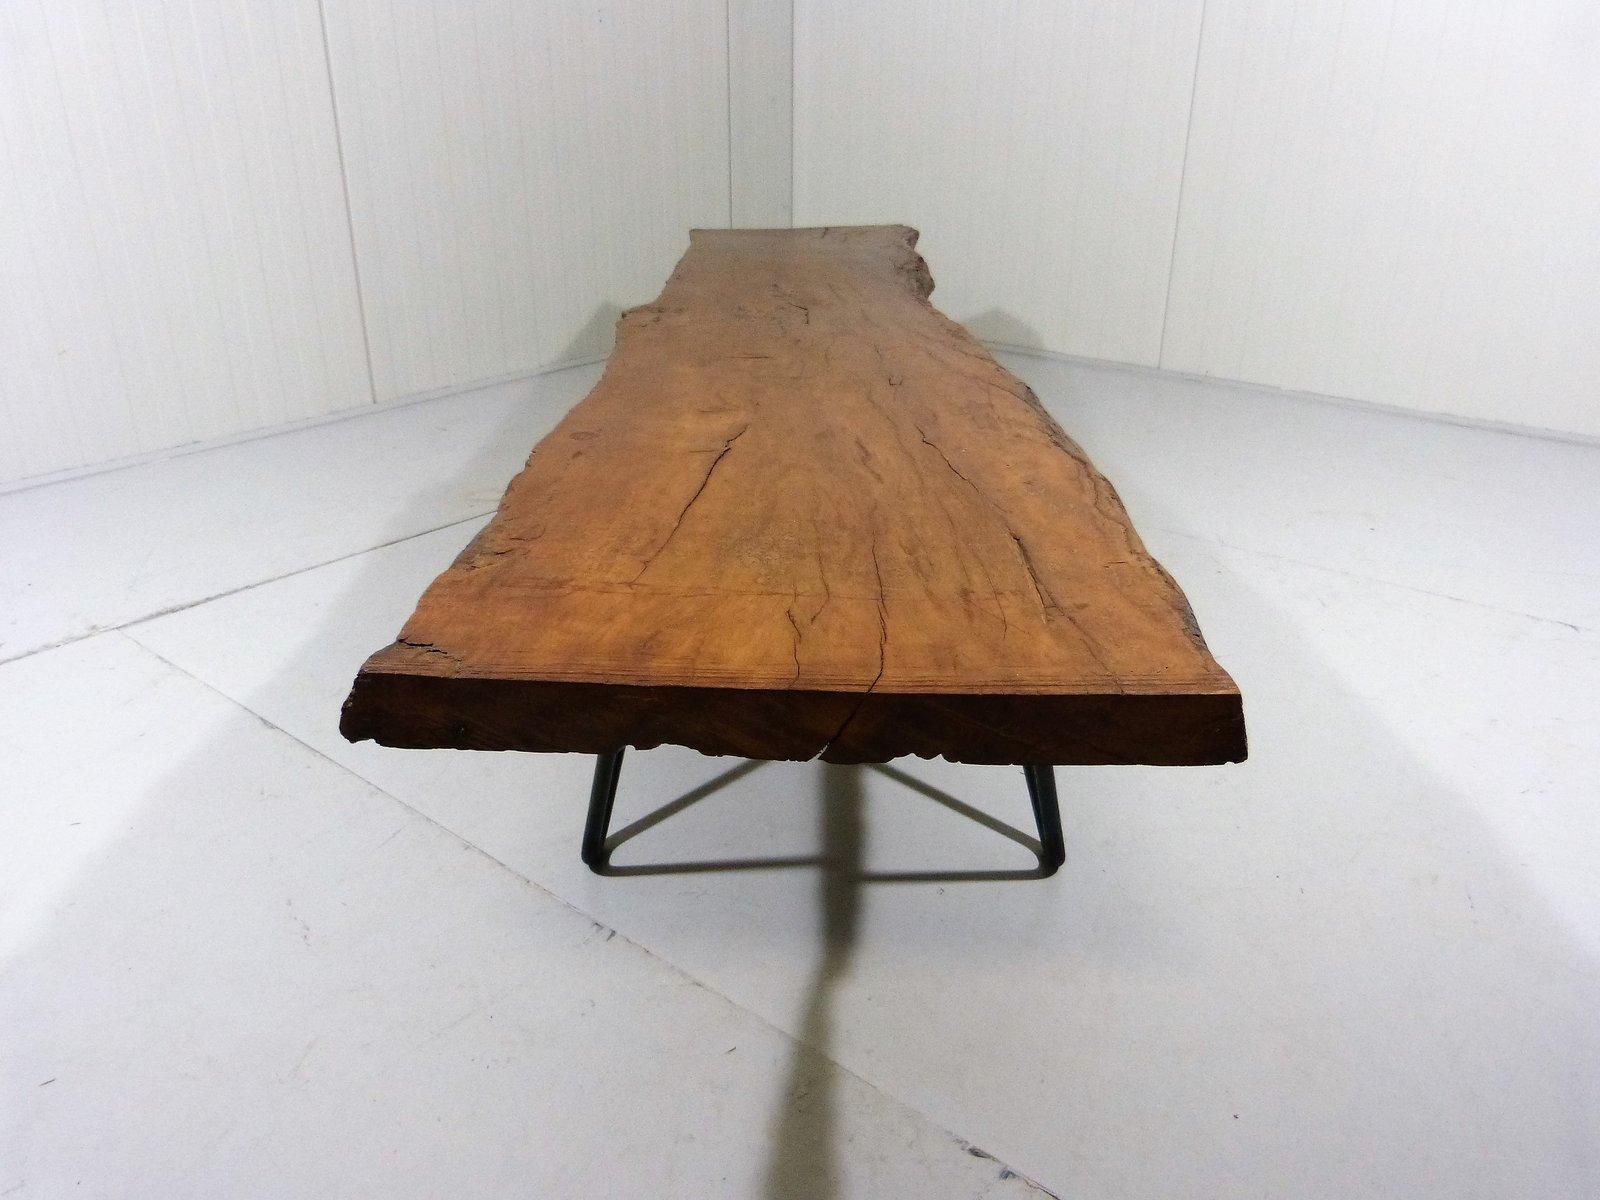 grande table basse tronc d arbre recycl vintage en vente. Black Bedroom Furniture Sets. Home Design Ideas